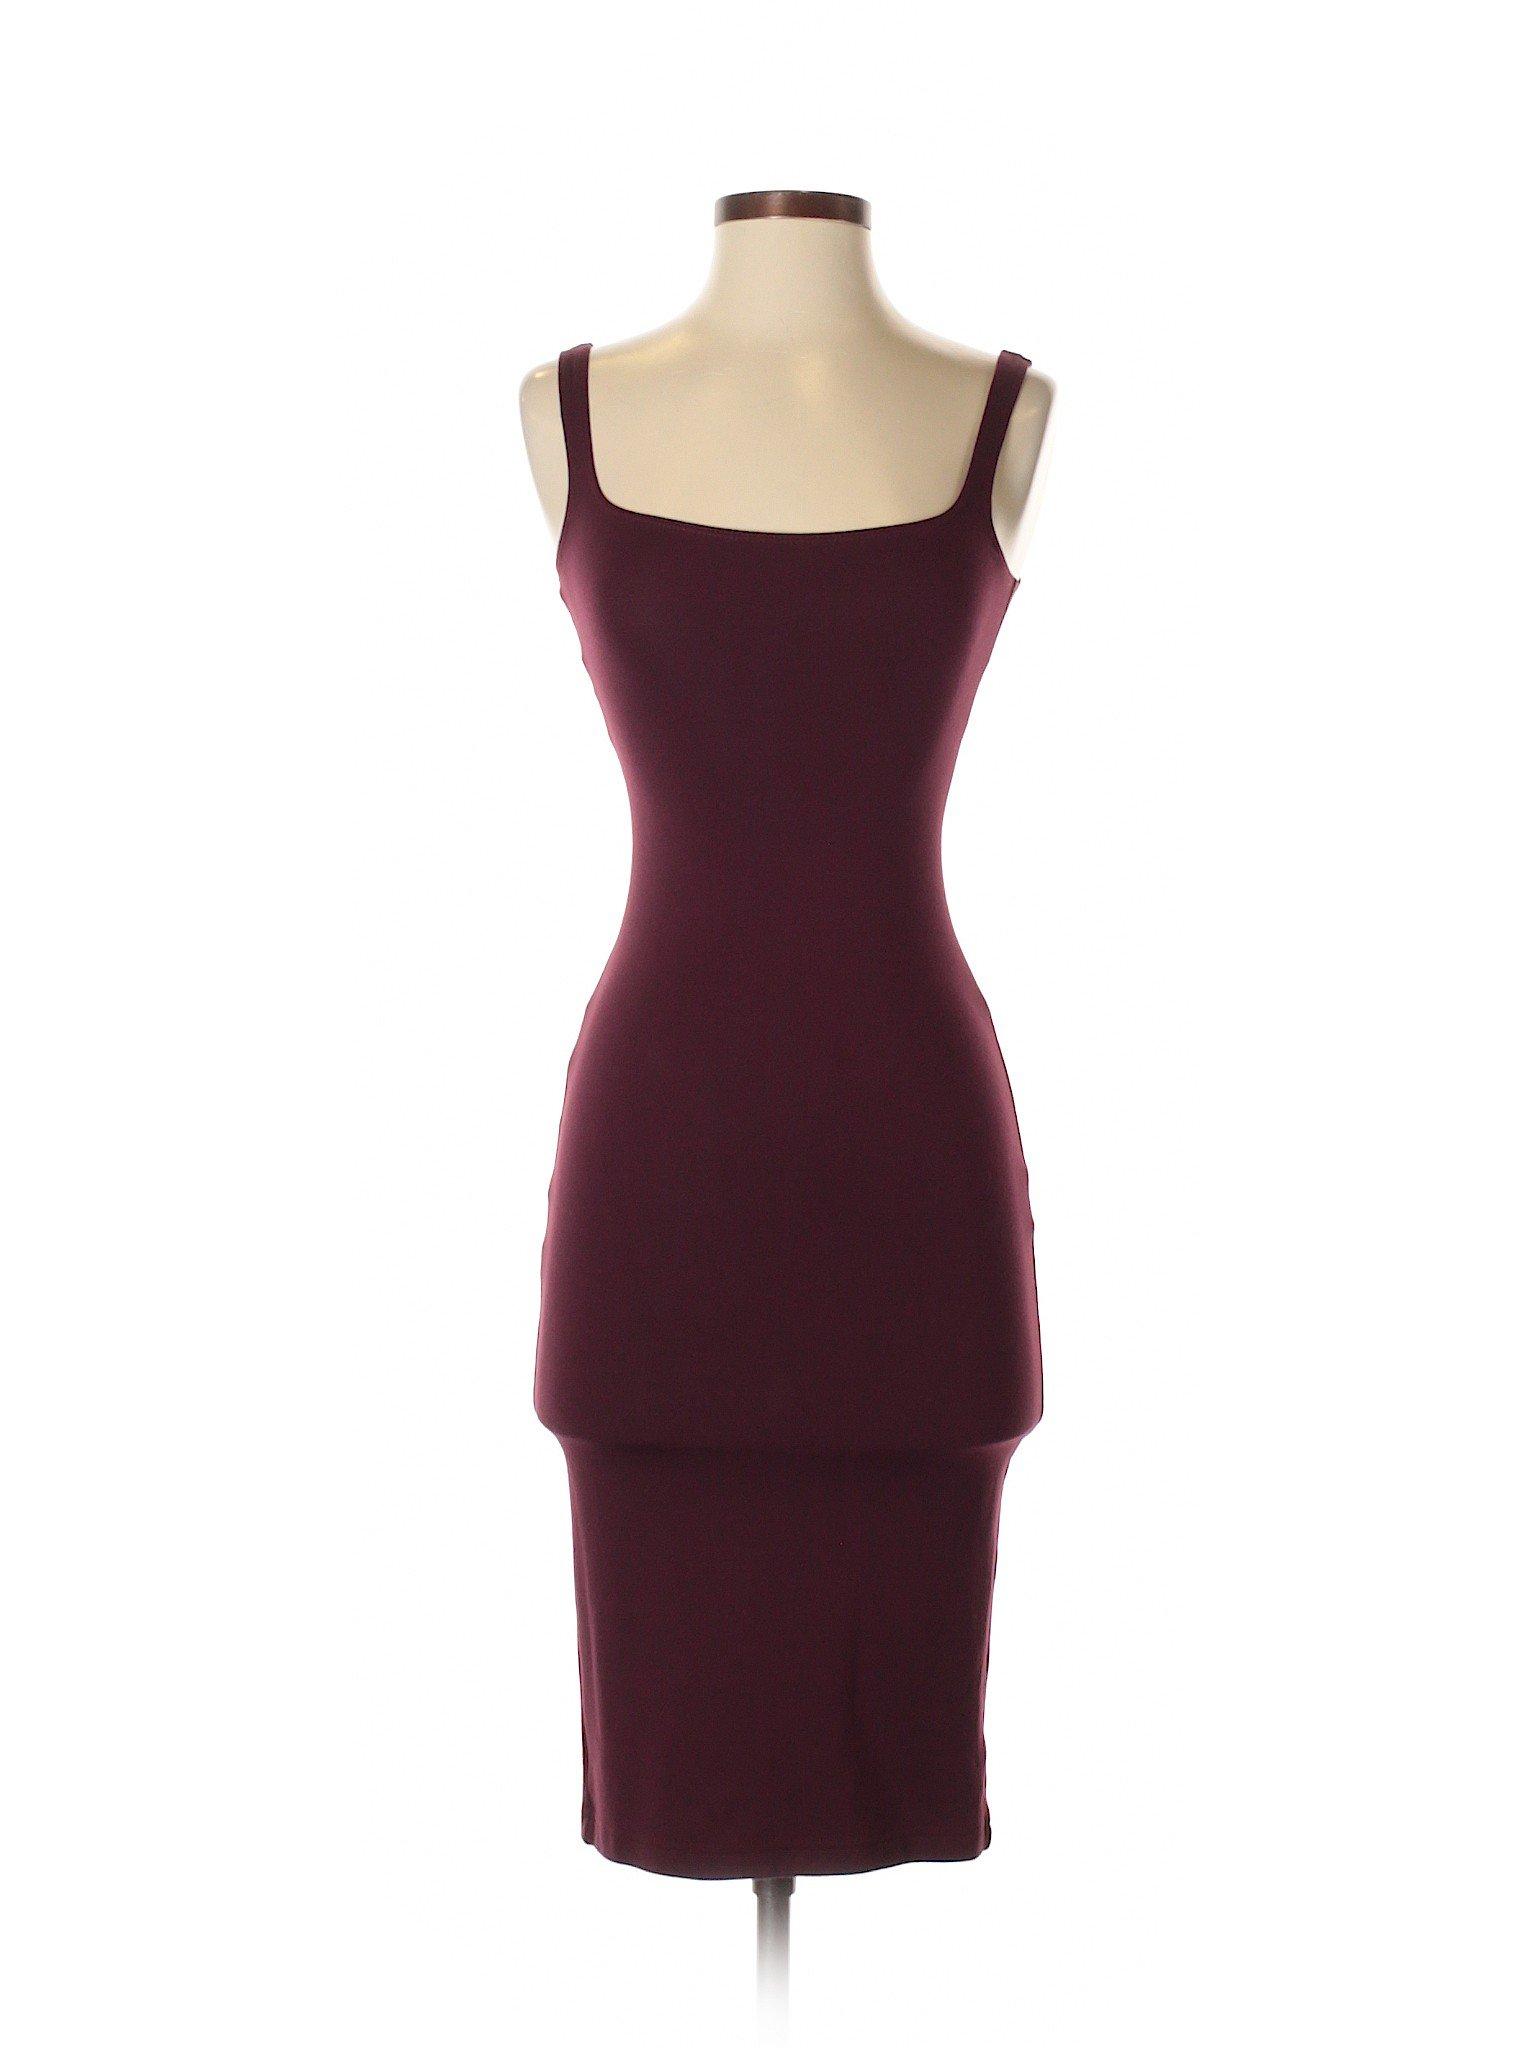 Apparel winter Casual Dress American Boutique qFH7Yn